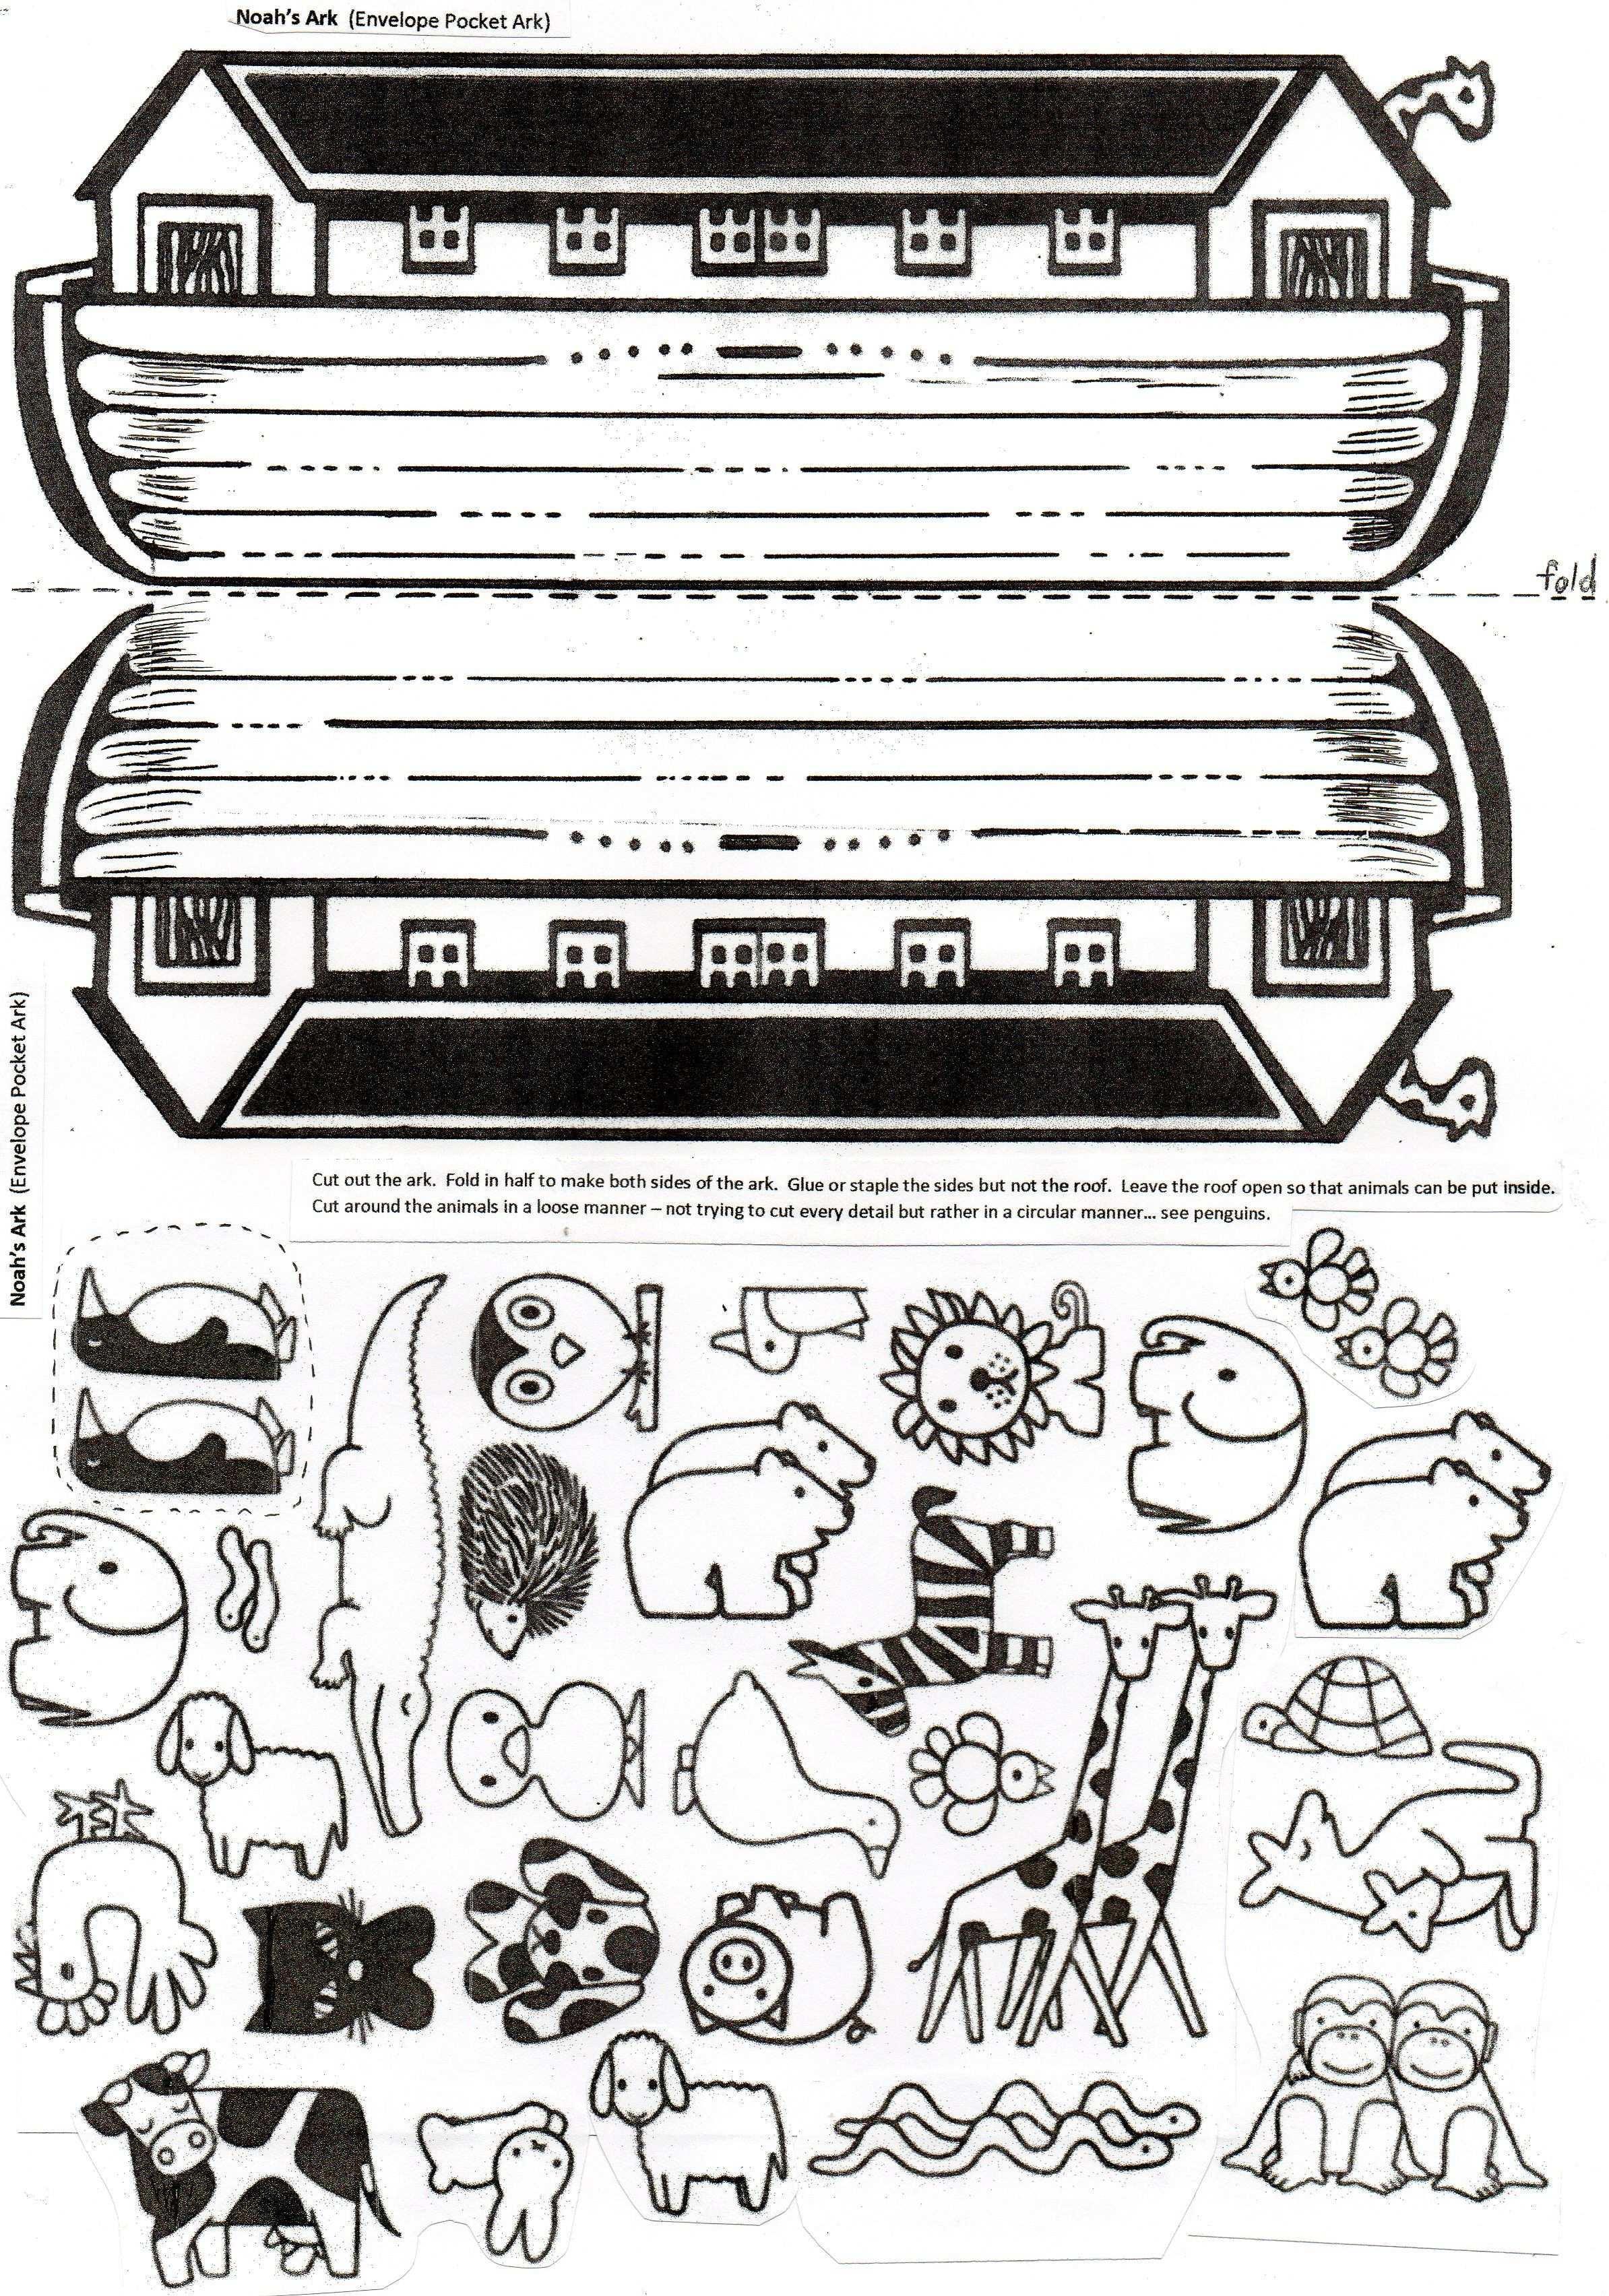 Noah S Ark Craft This Folded Paper Envelope With Ark Animals Inside Will Delight Children Easy To Asse Bibel Bastelprojekte Kinderbibel Sonntagsschule Basteln